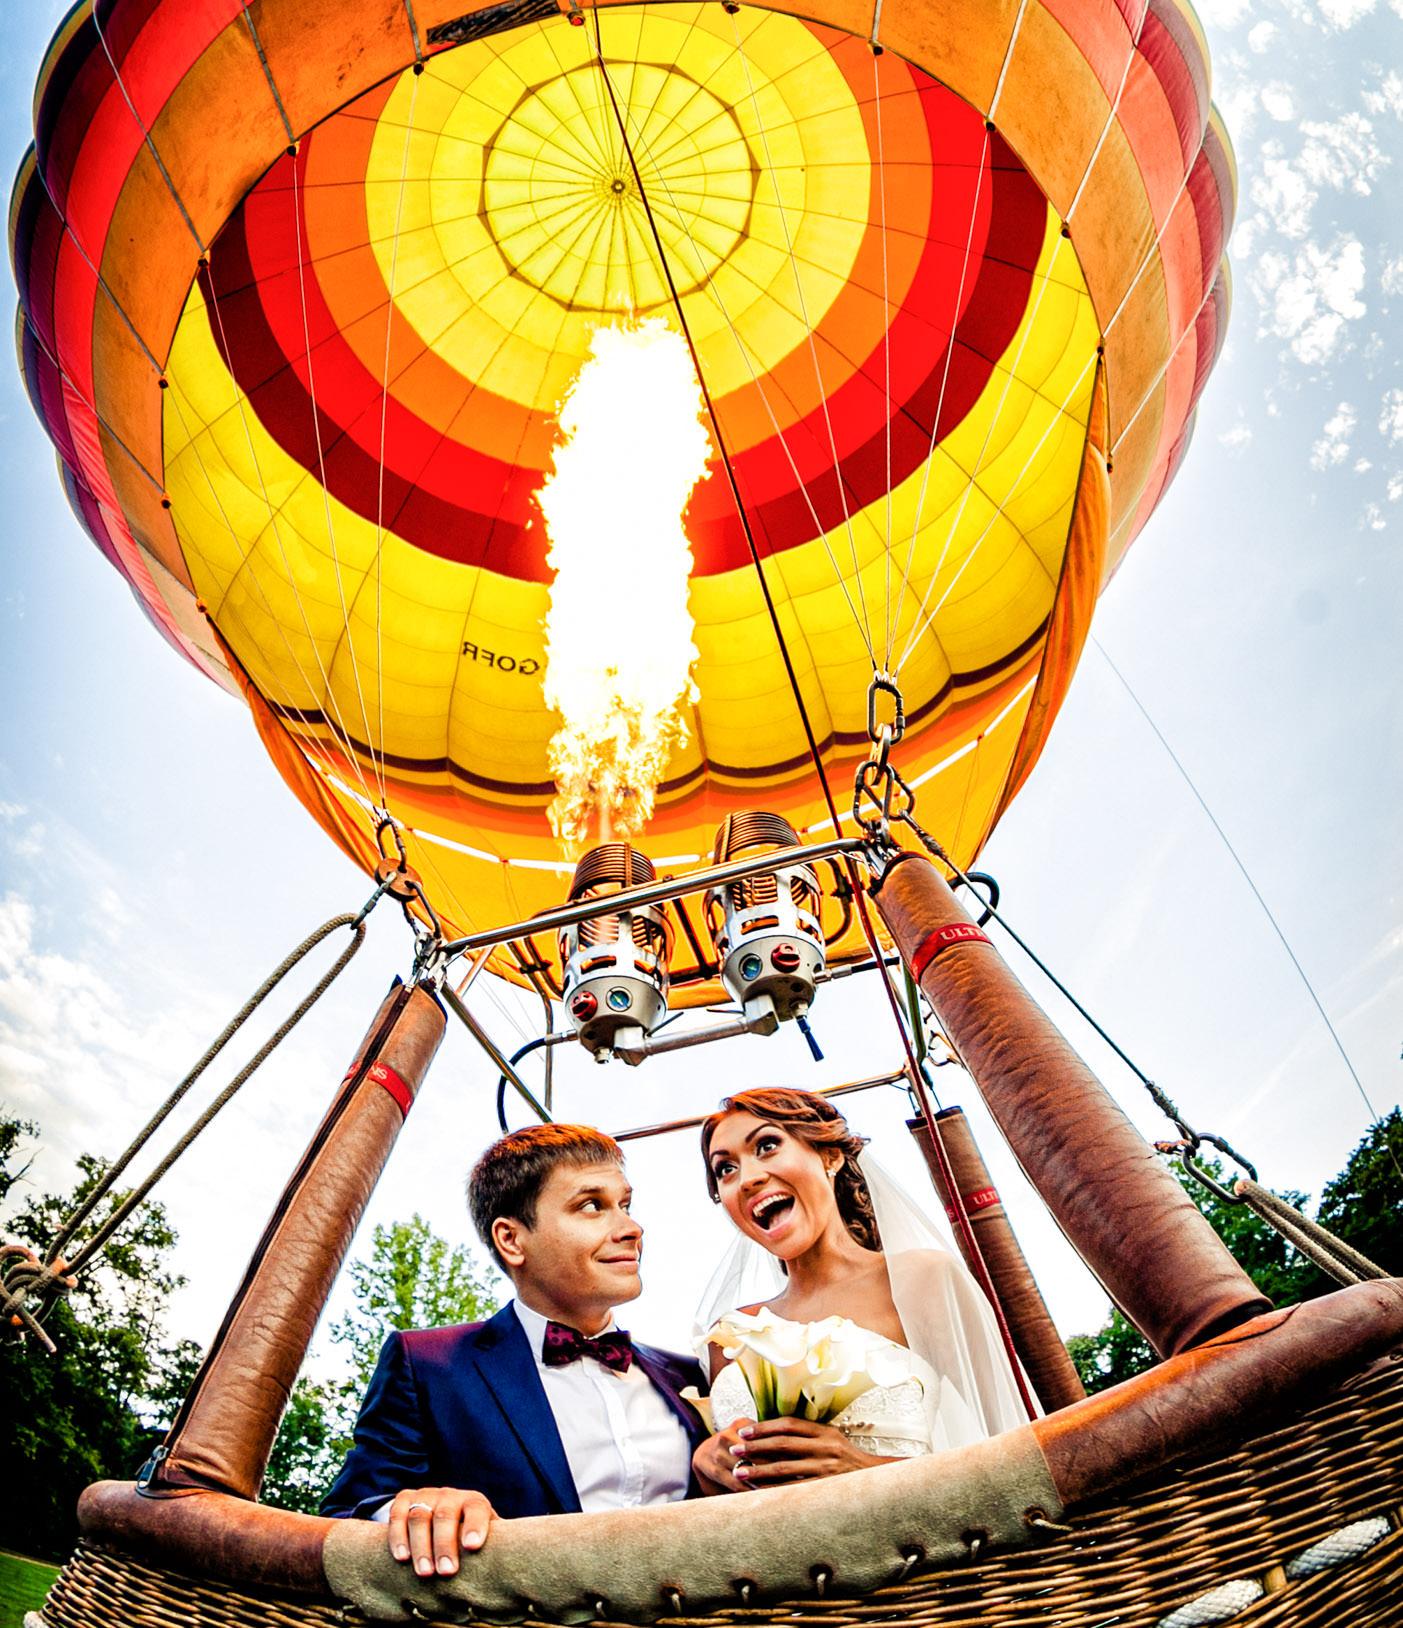 wedding hot air balloon